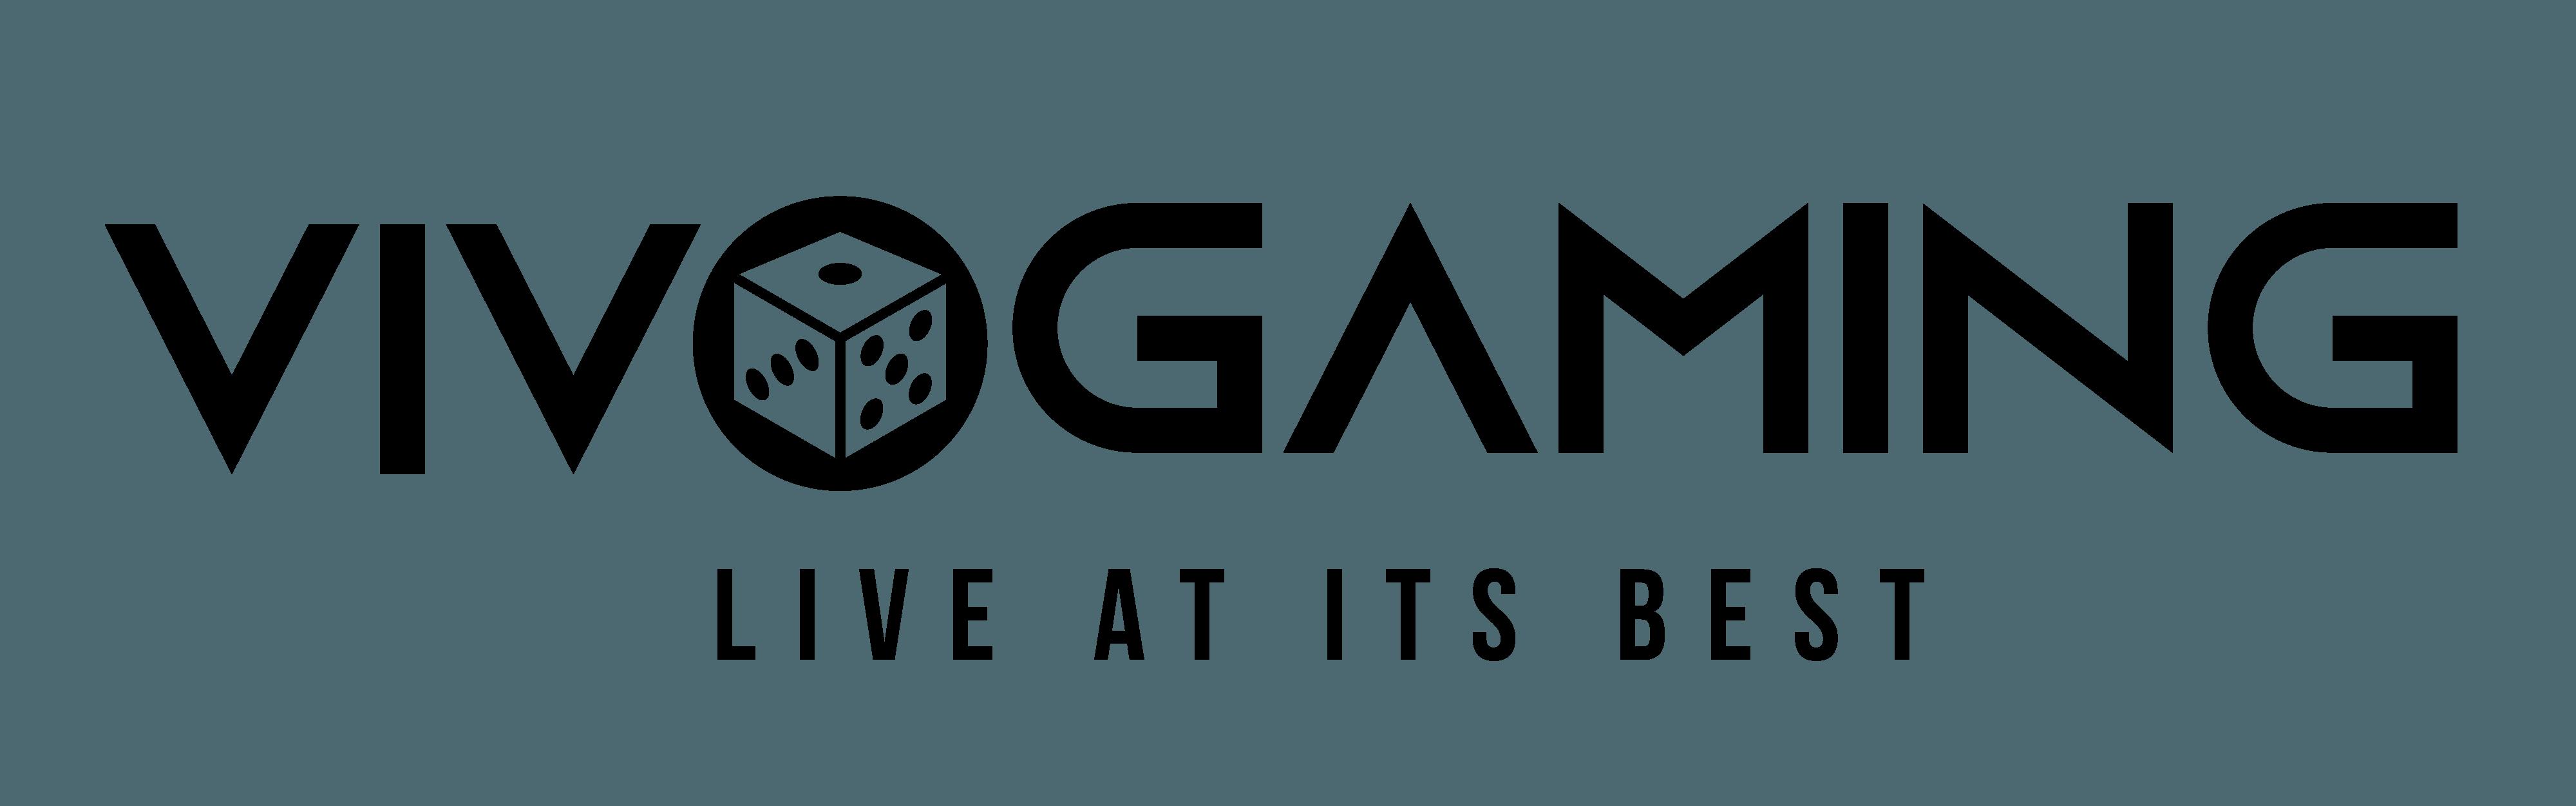 Vivo Gaming games